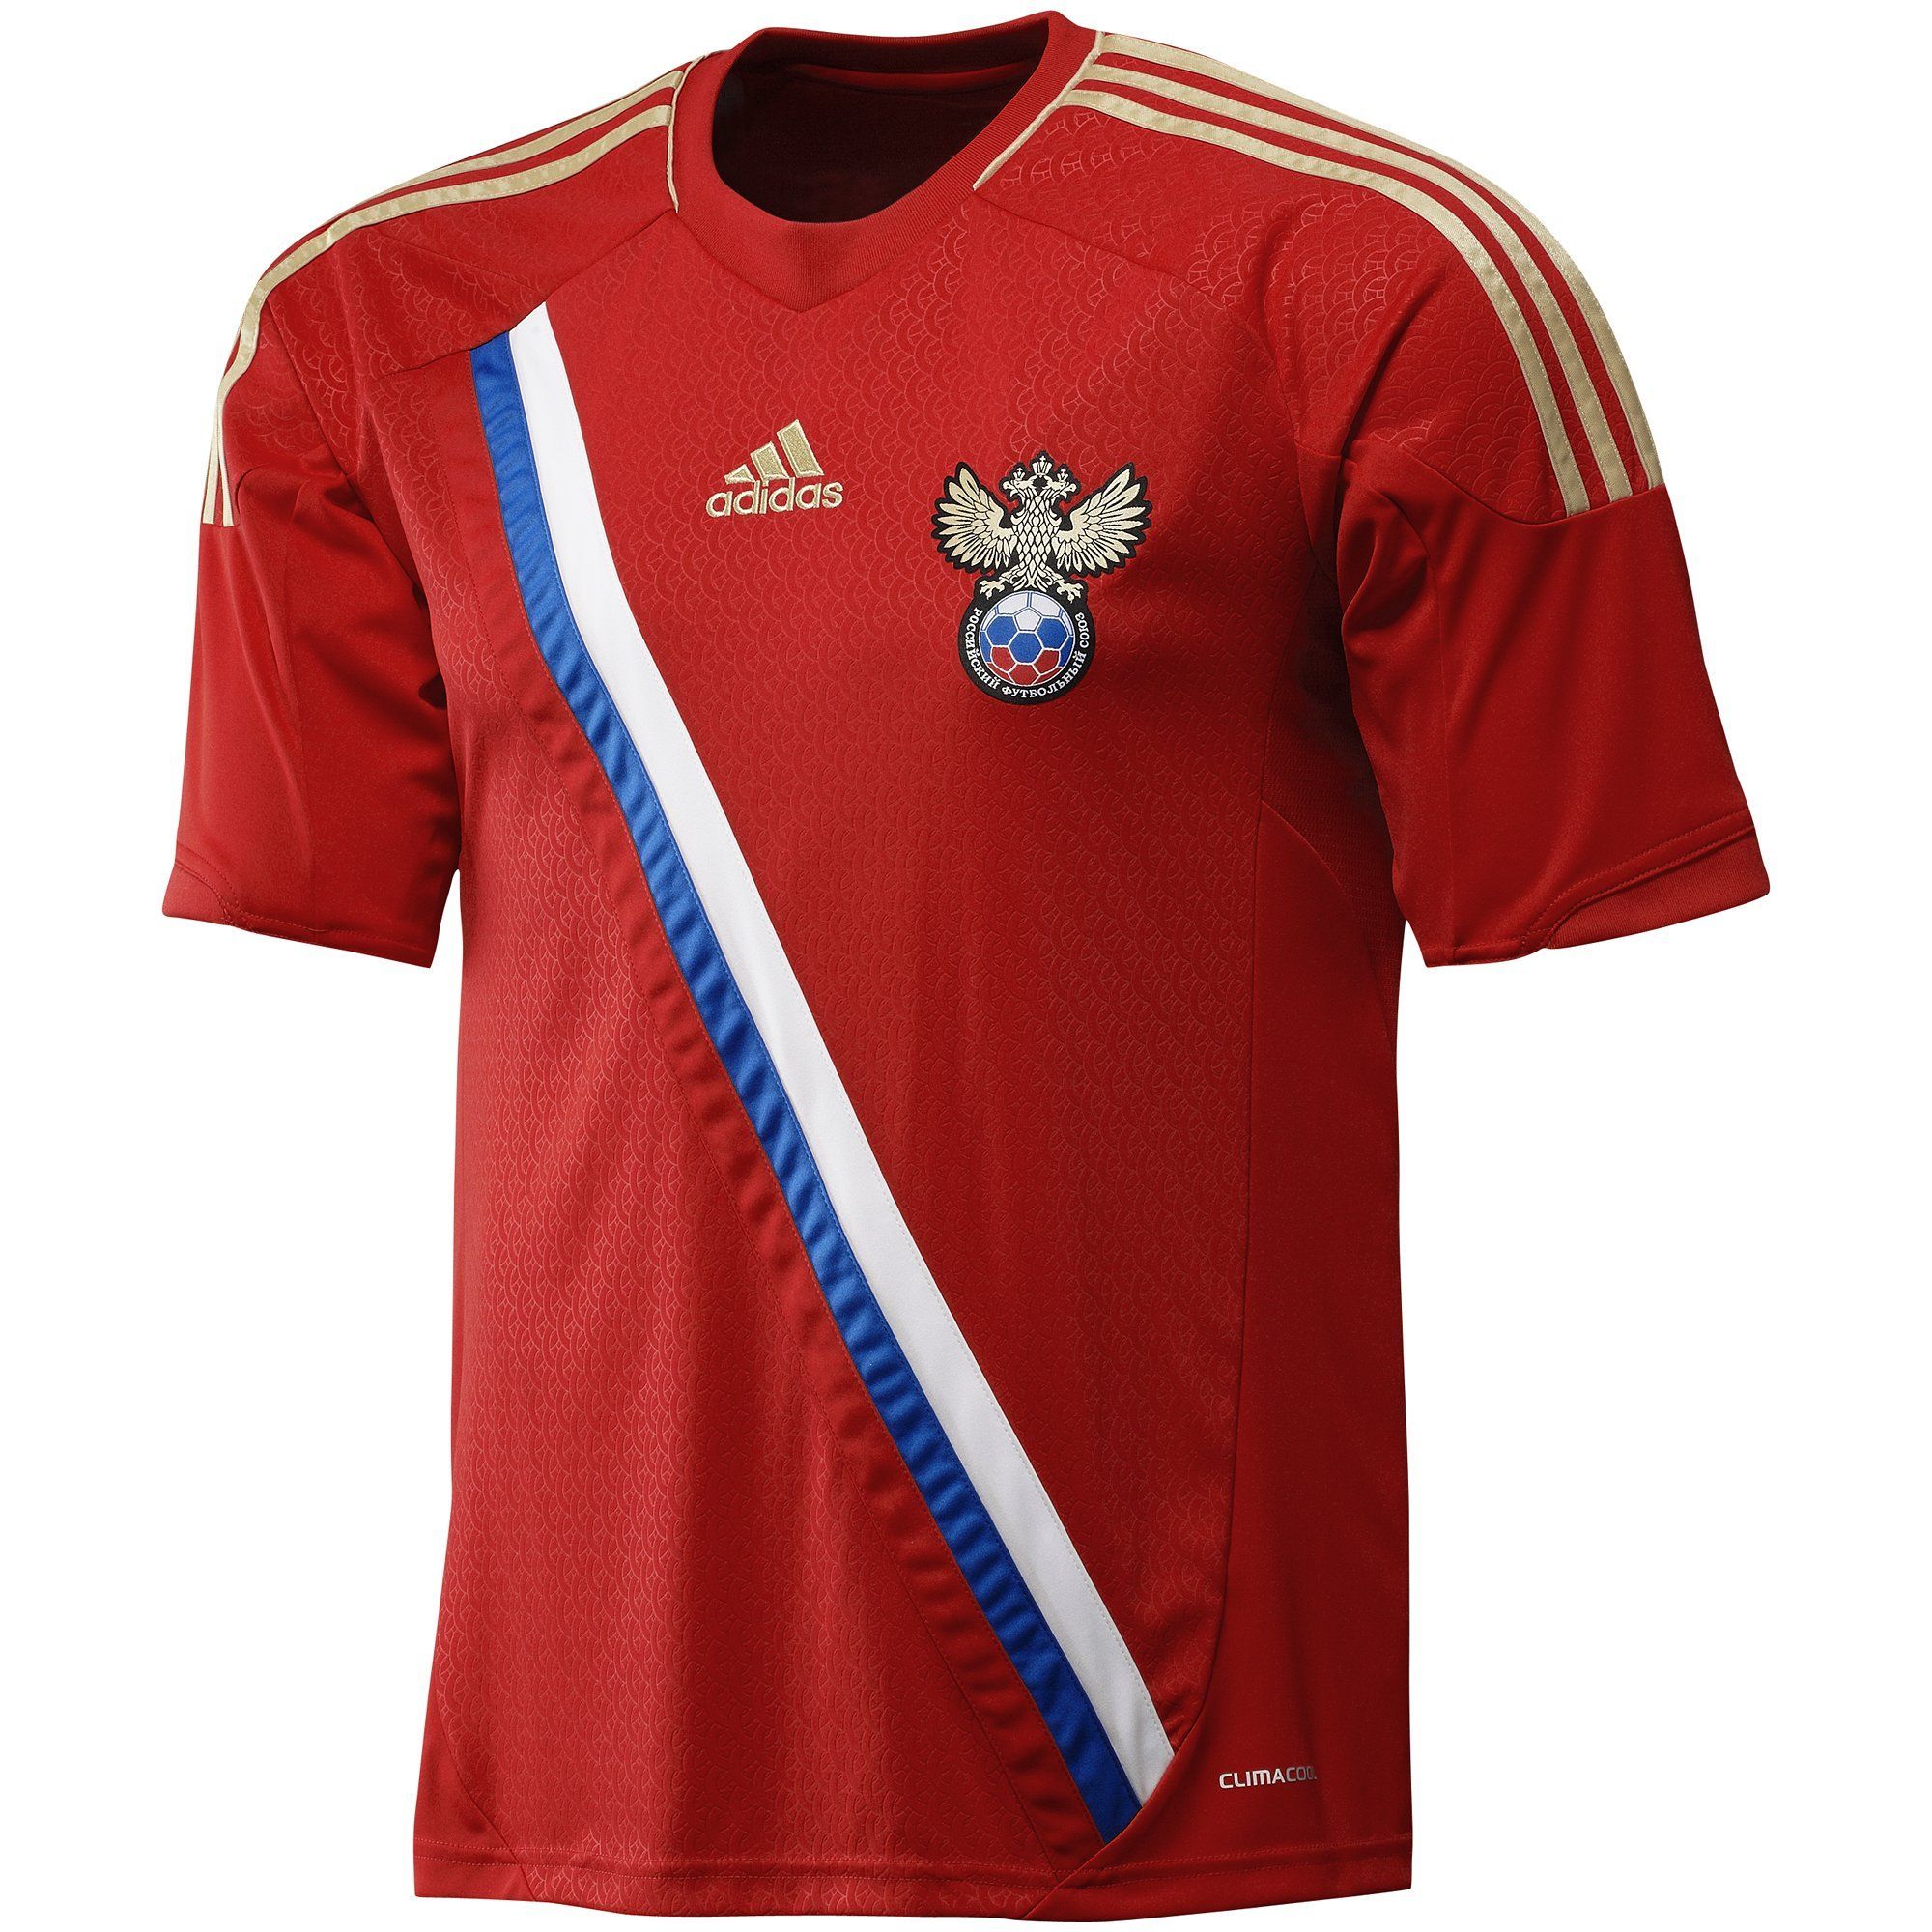 8908dae7 adidas Russia home jersey EURO 2012 Adidas Football, Football Jerseys,  Basketball Jersey, Euro